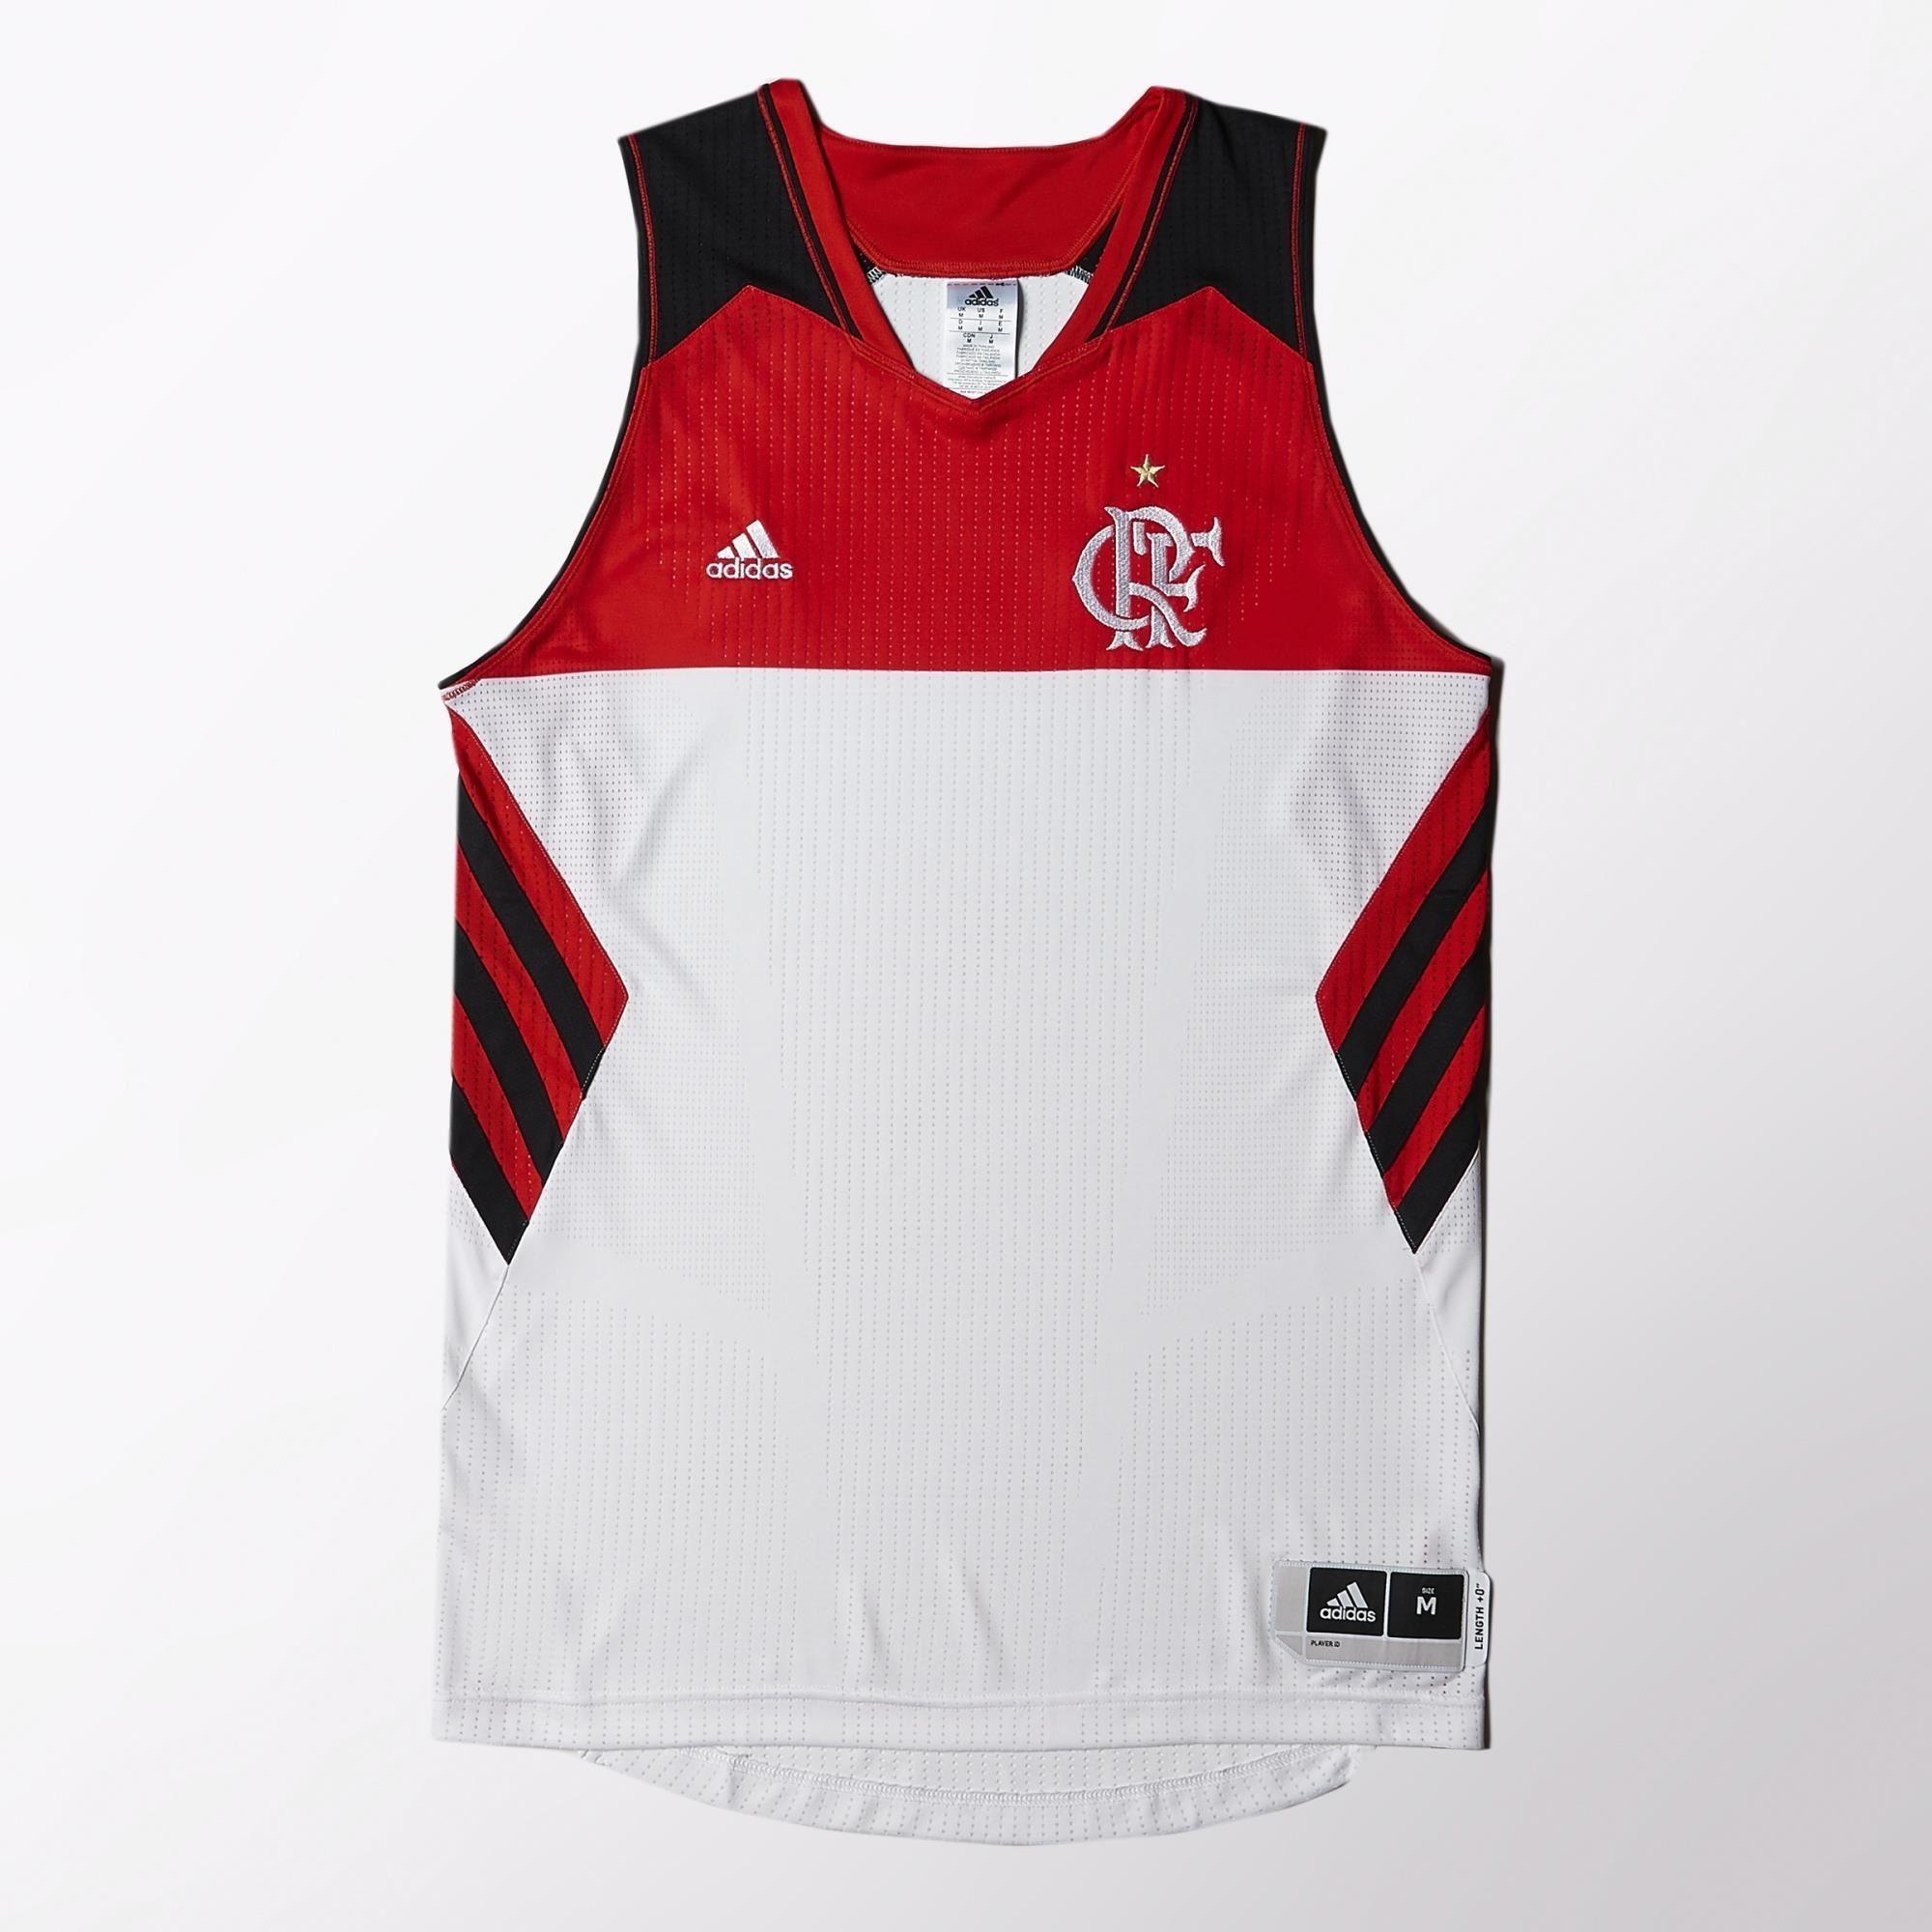 b1cb0e0f49 adidas - Regata Basquete Flamengo | Flamengo! | Regata basquete ...